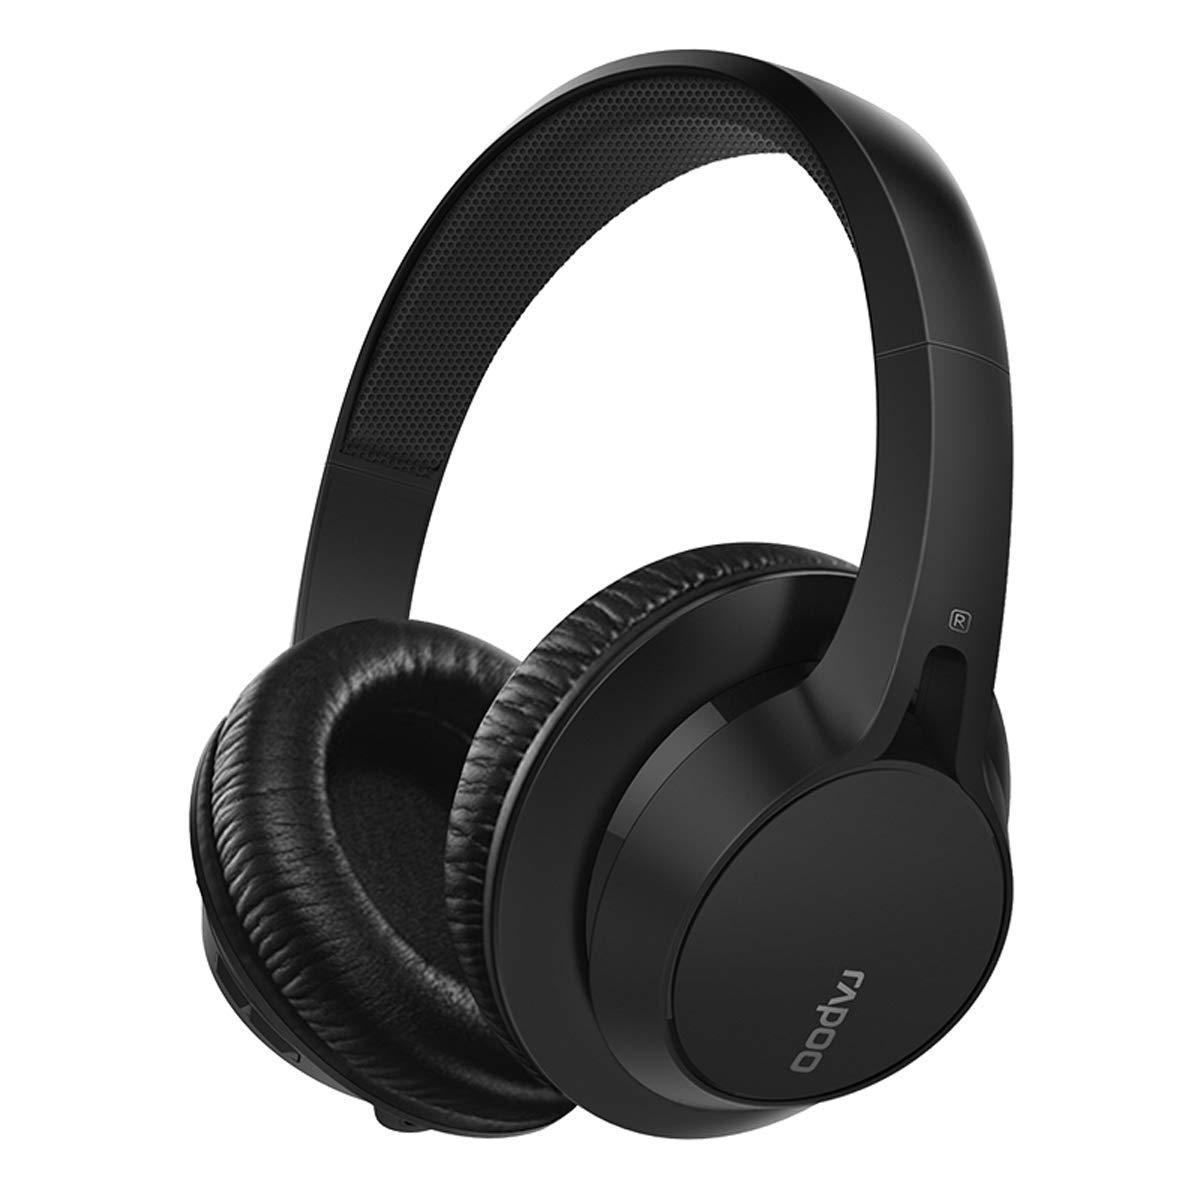 Auriculares Rapoo Bluetooth Con Cable/inalambrico Modes Con Hidden Mic Recargable Hi-fi Stereo Of Soft Earpads Para Wind